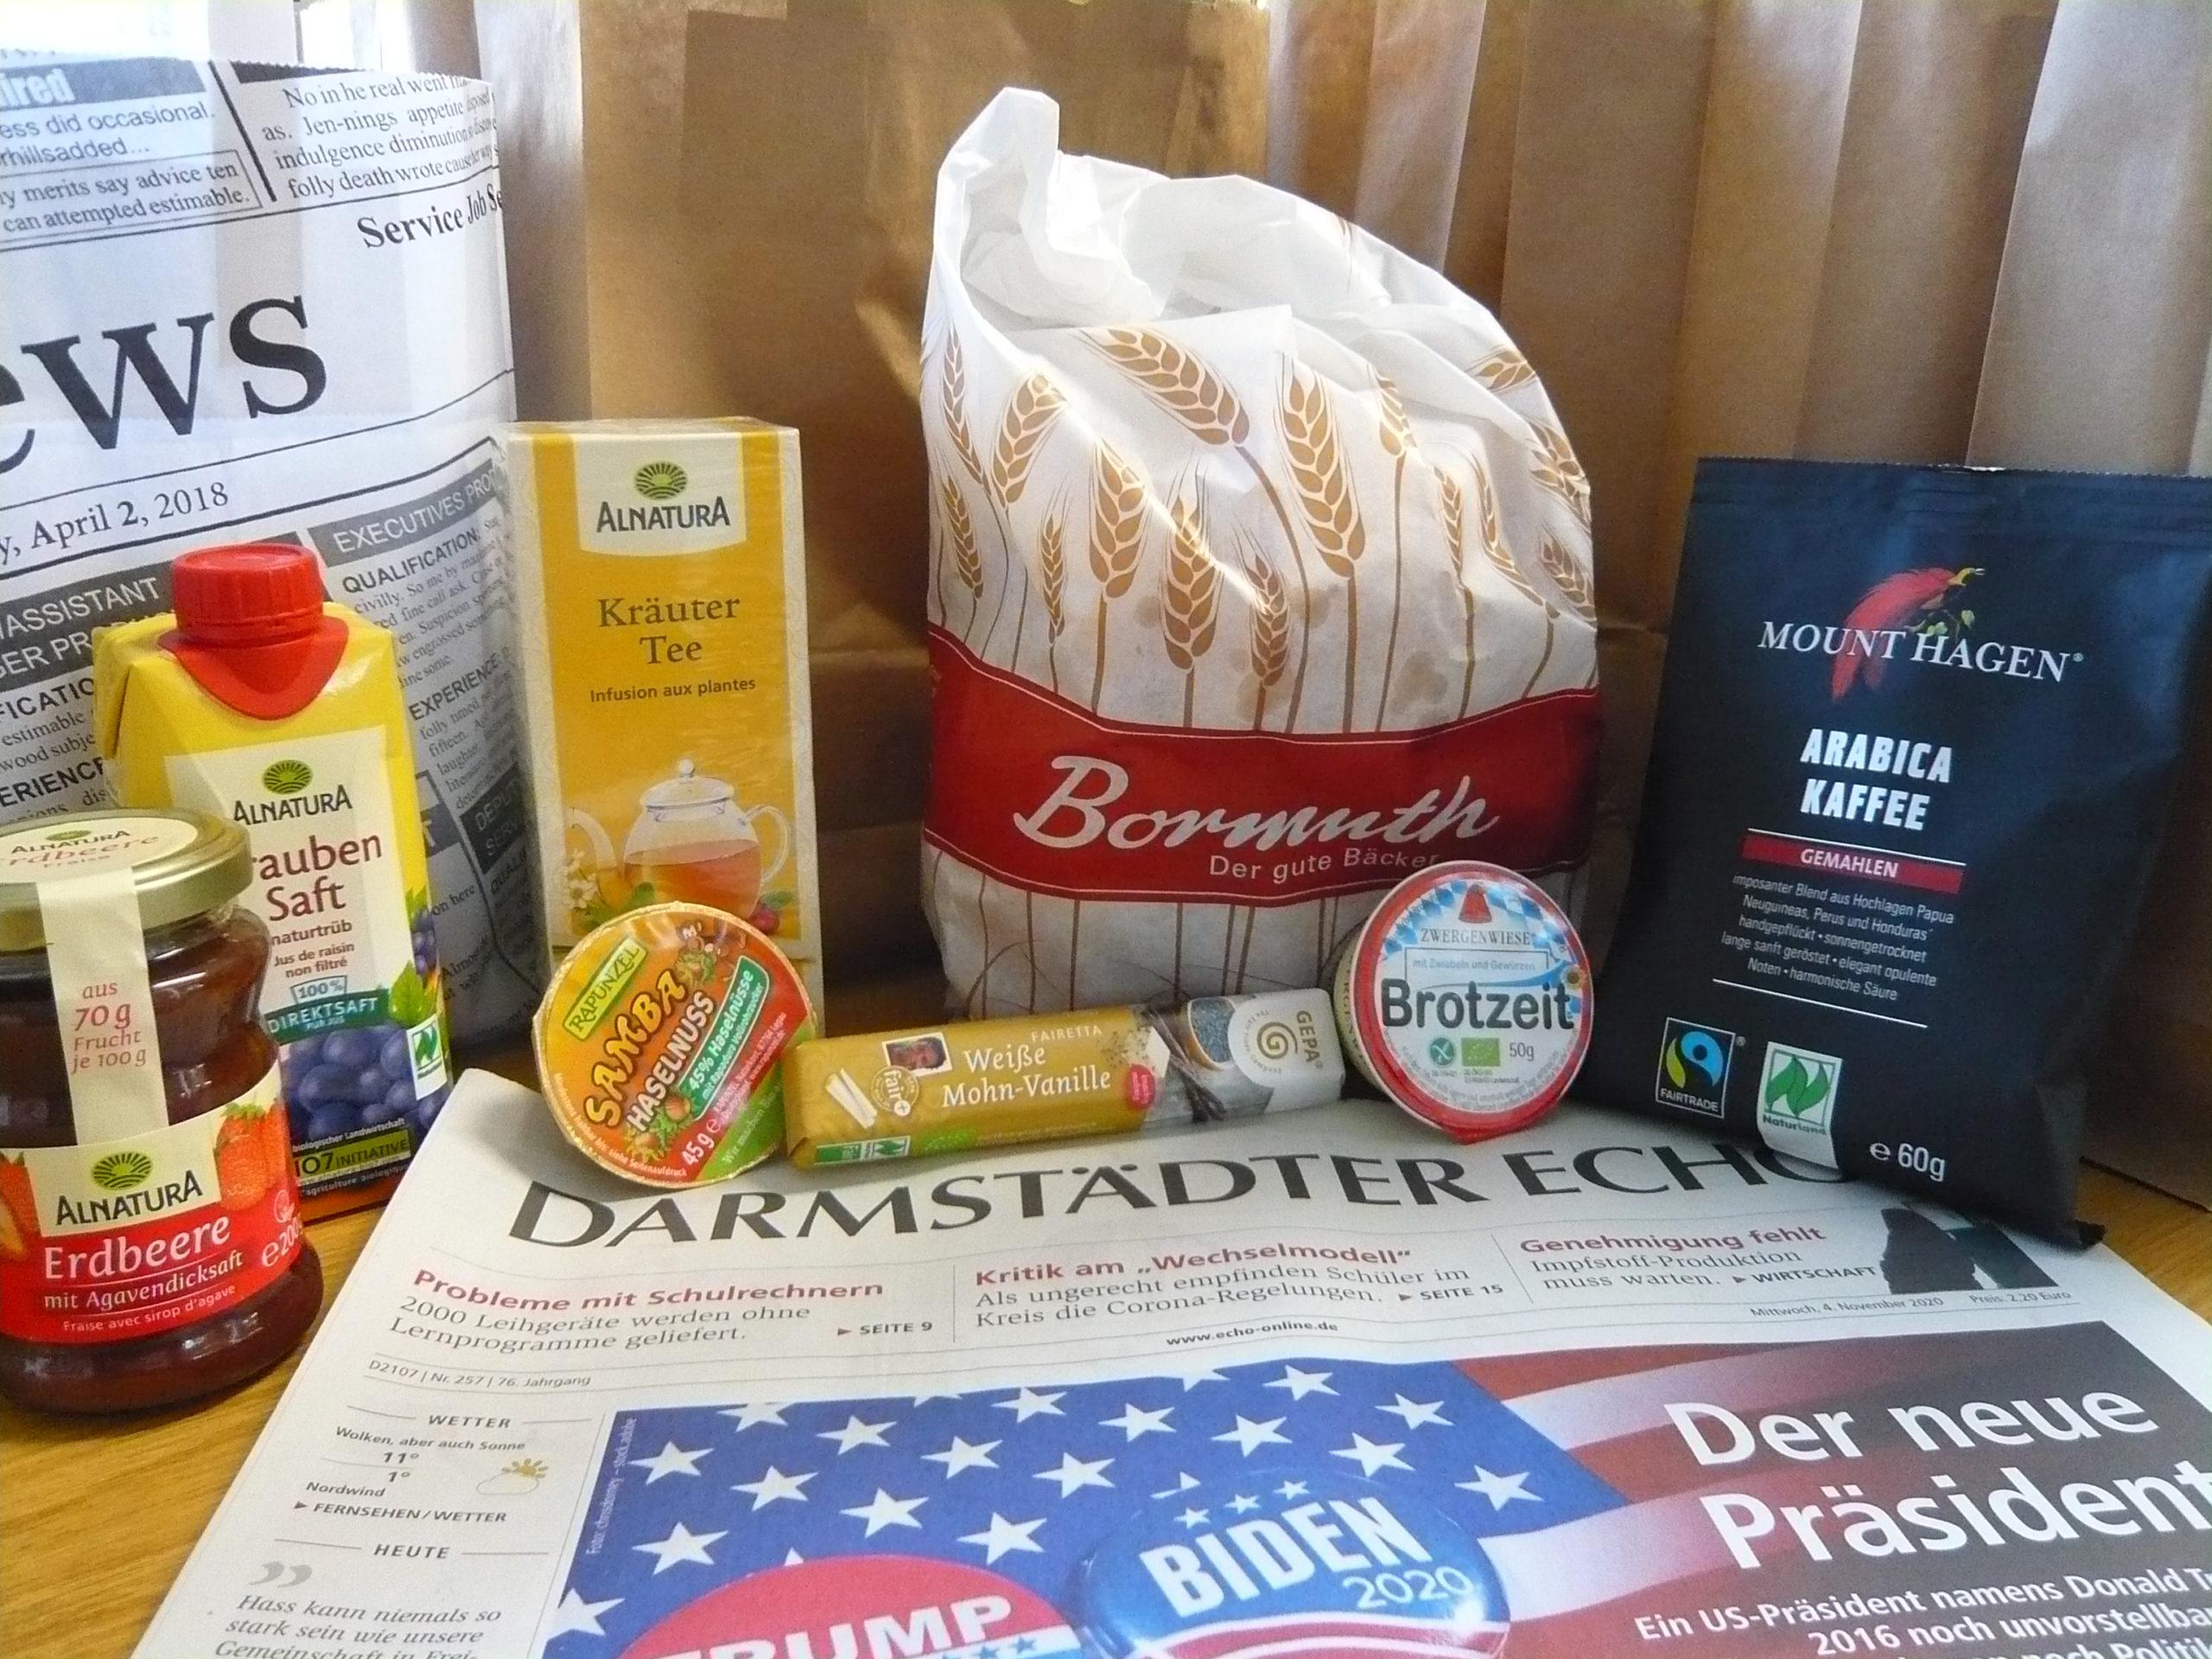 Corona-Hilfe: Die 11. Kochtüte kommt als Frühstücks-Morgengruß daher…